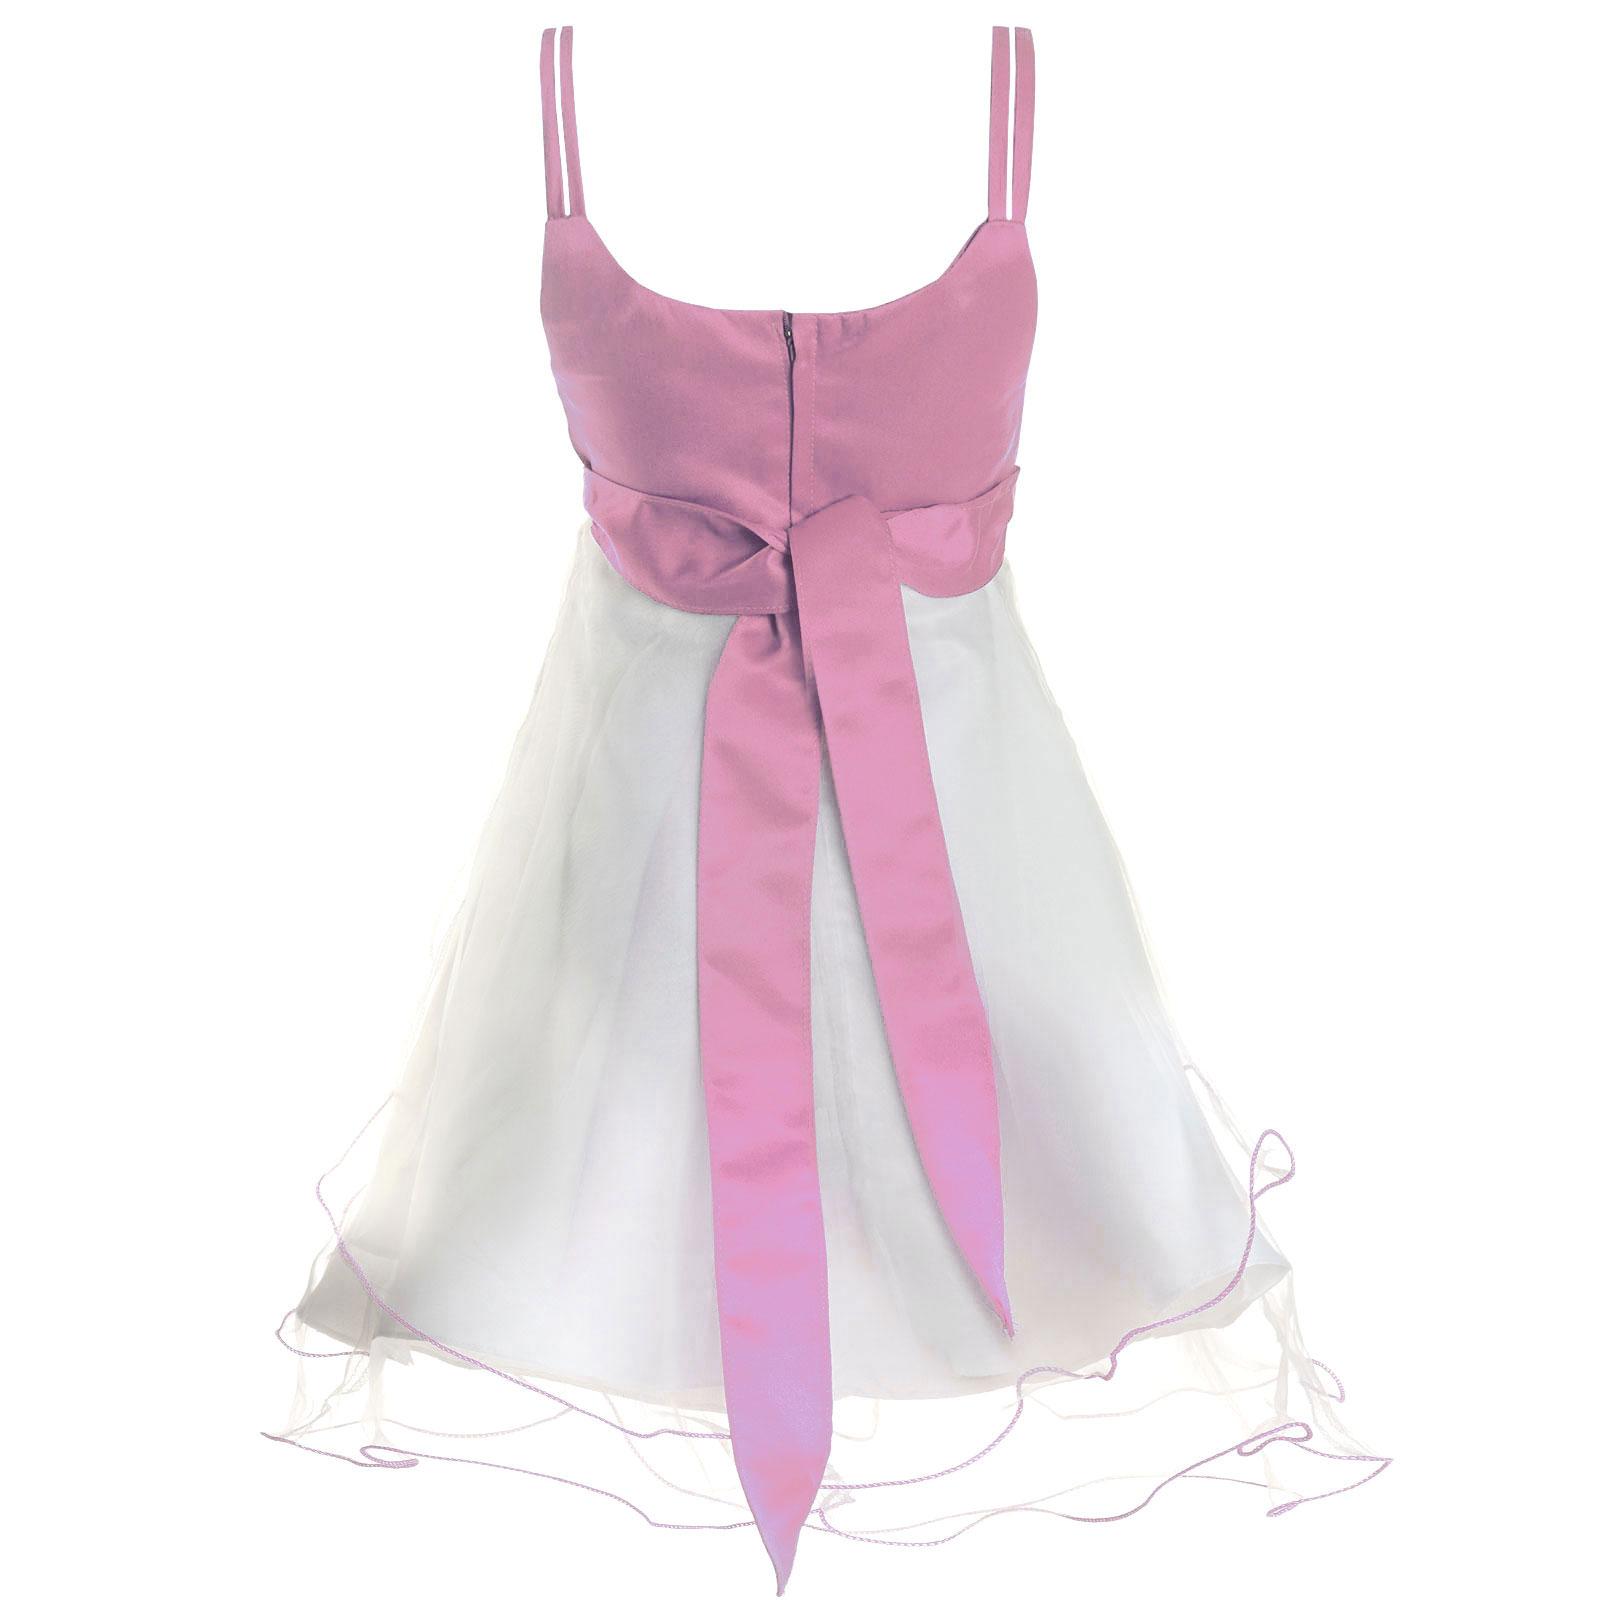 Maedchen-Kinder-Kleid-Peticoat-Festkleid-Lang-Arm-Kostuem-mit-Bolero-Rose-21476 Indexbild 17